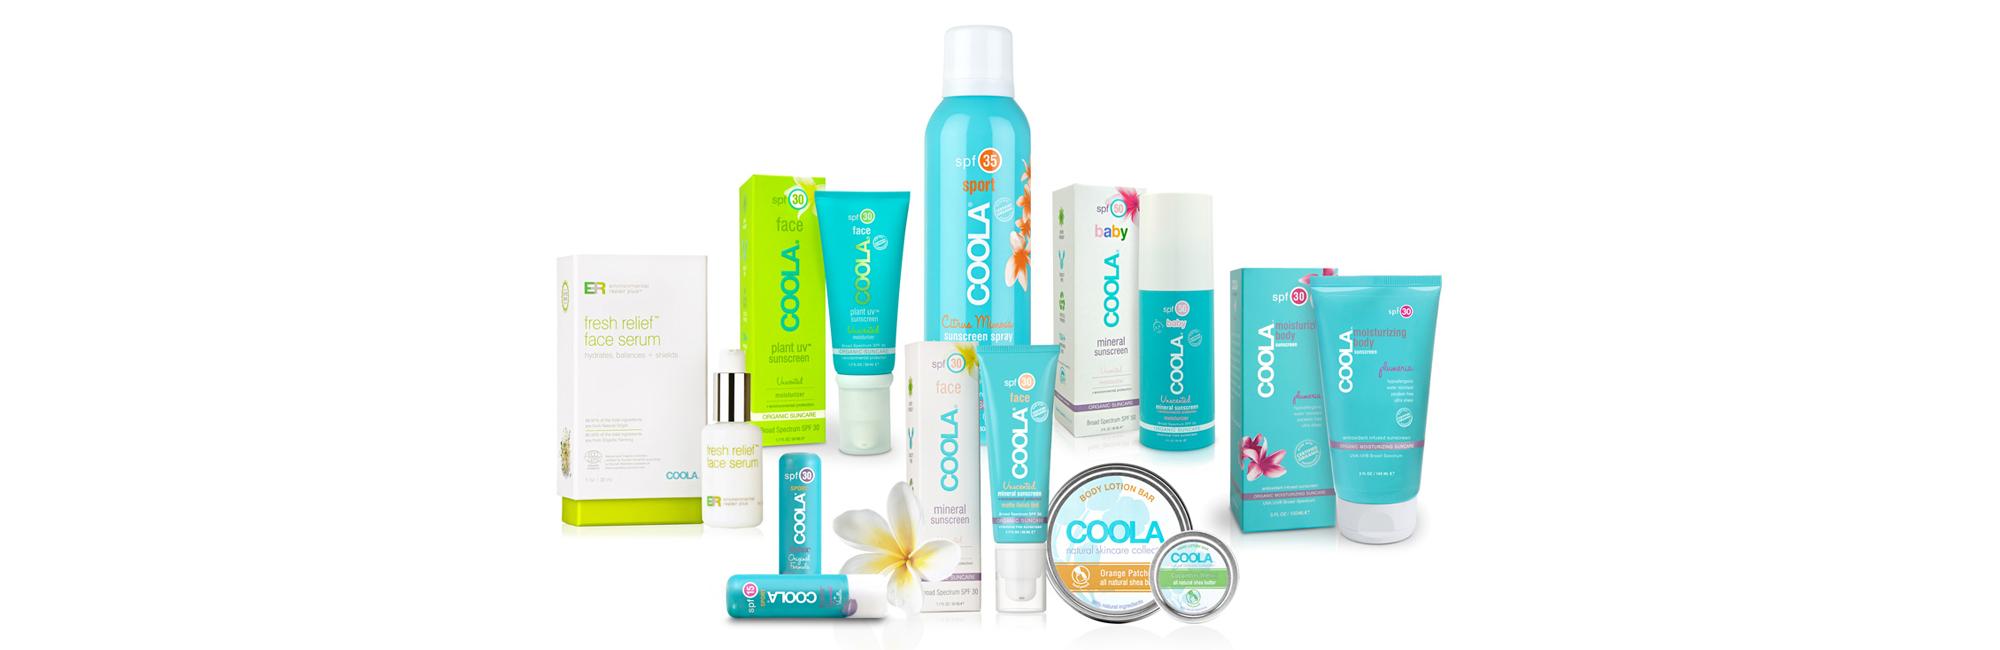 COOLA Suncare | Organic Sunscreen + Organic Suncare